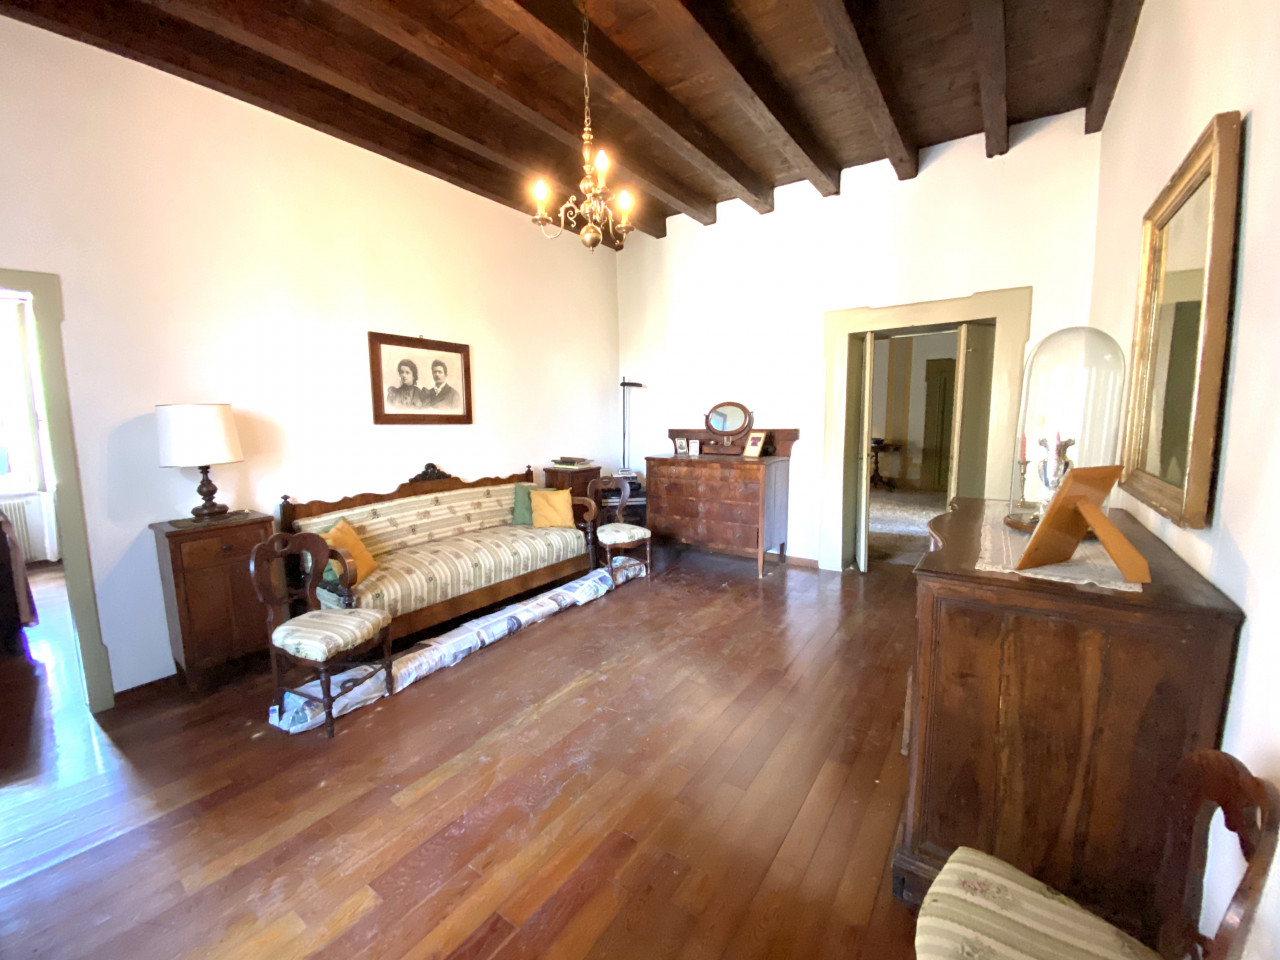 Dimora Storica in vendita in Centro a Valvasone - Rif.P1 https://images.gestionaleimmobiliare.it/foto/annunci/200820/2282895/1280x1280/009__img_3575.jpg